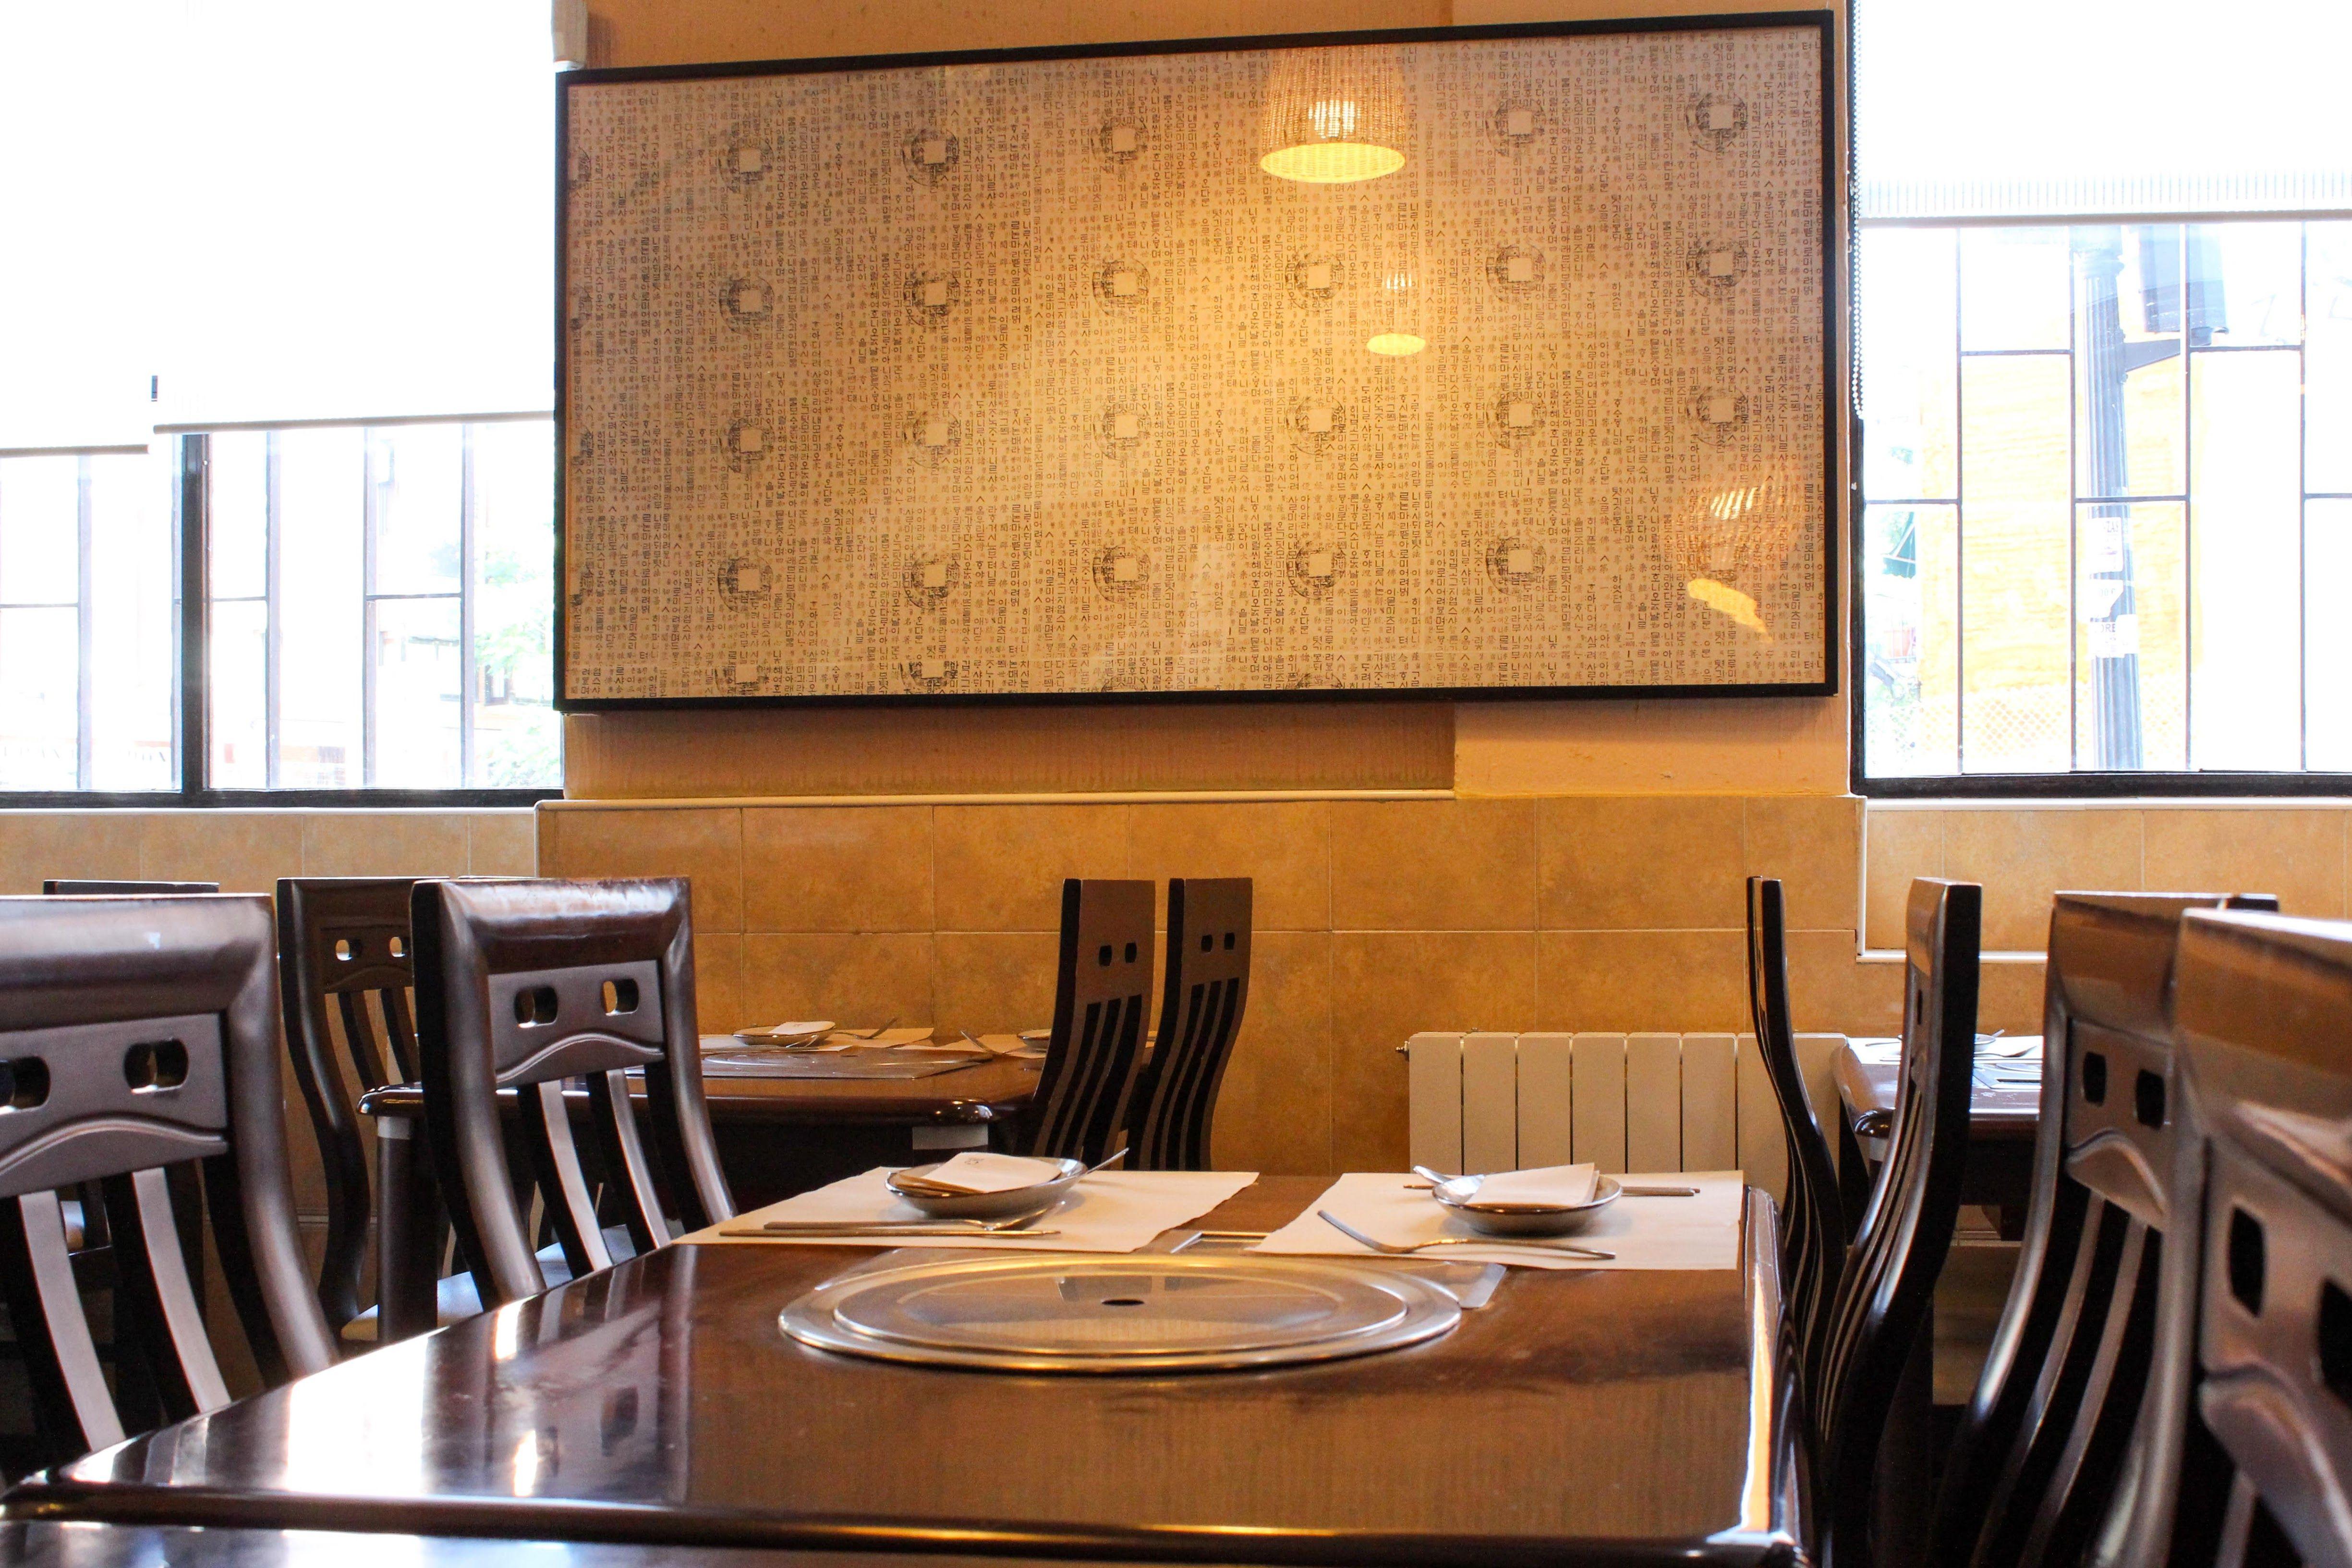 Foto 4 de Cocina coreana en Madrid | Restaurante Seoul